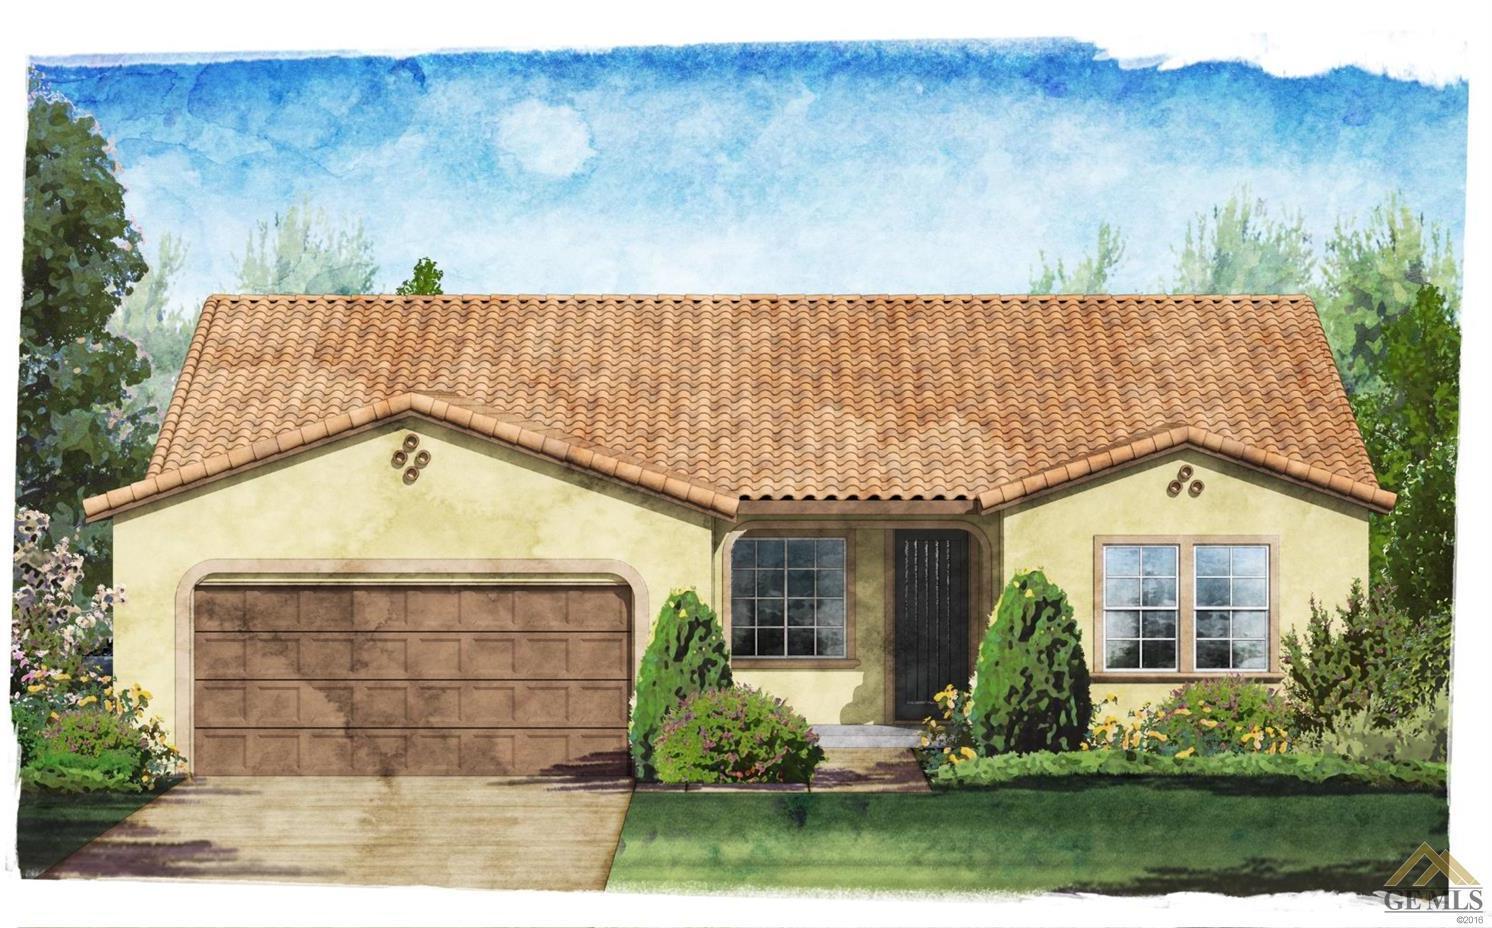 7816 Glisten Way Bakersfield Ca 93313 Compass,Home Design Furnishings